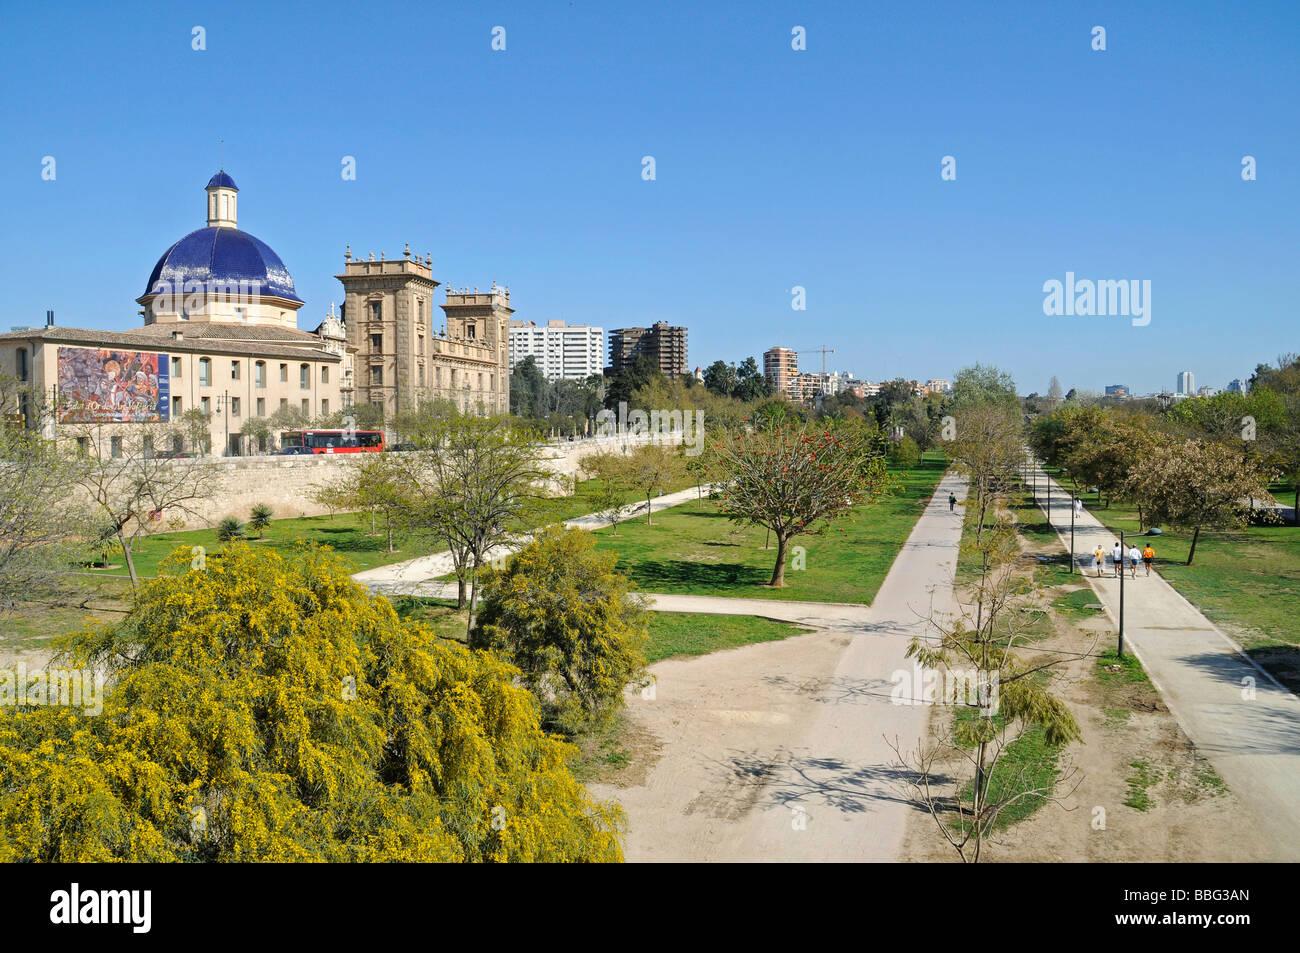 Jardines del turia rio turia river bed park museo de bellas stock photo 24325469 alamy - Jardin del turia valencia ...